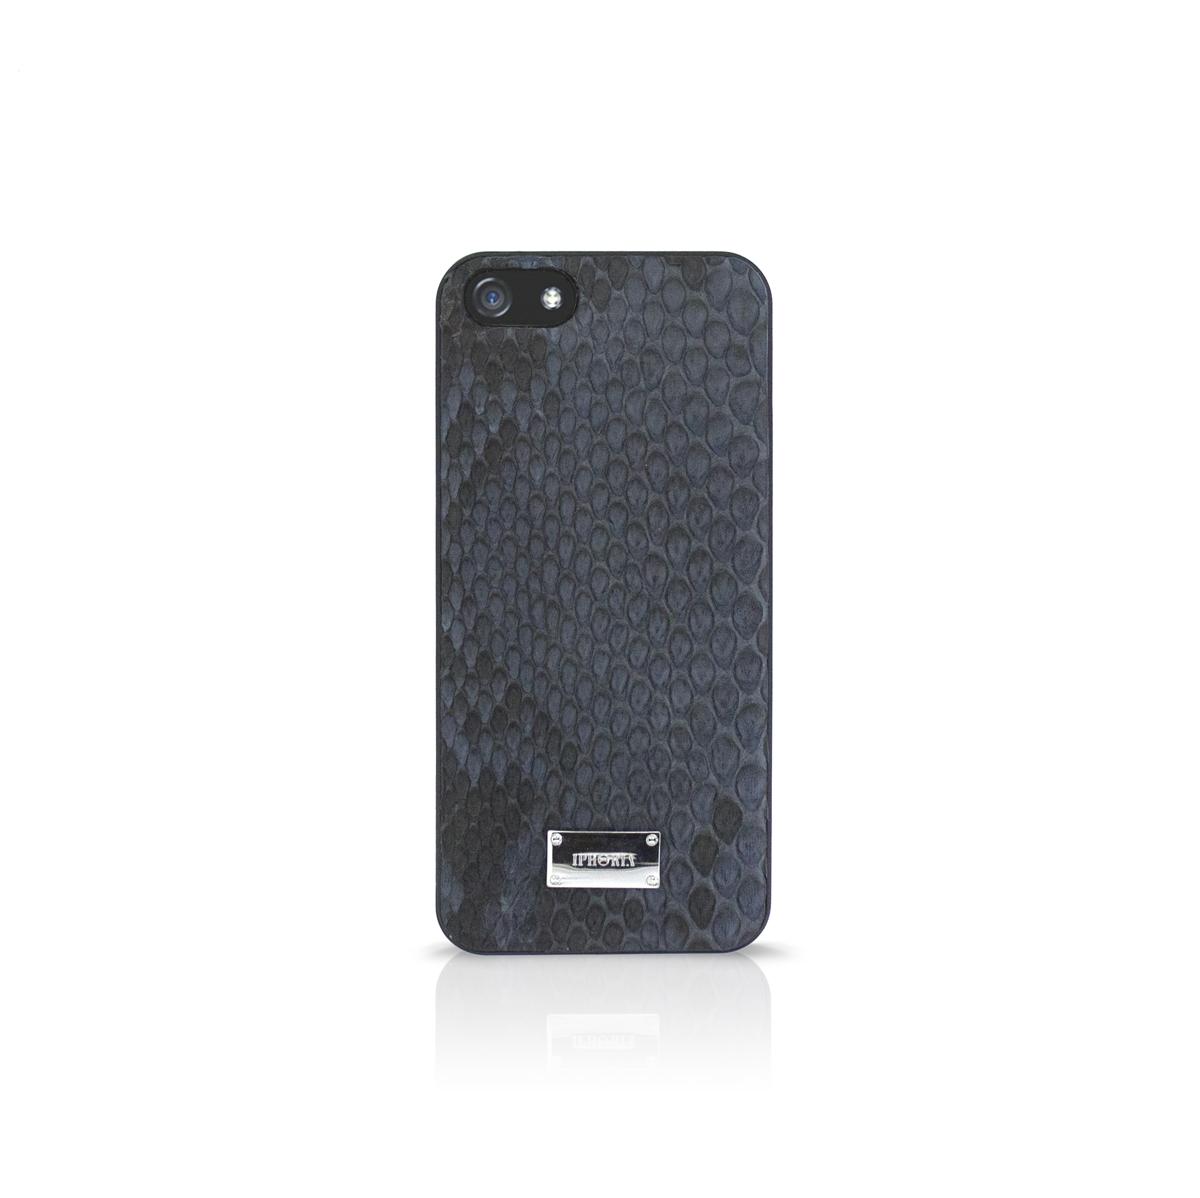 Hardcase Luxury Python Black für Apple iPhone 5/ 5S/ SE